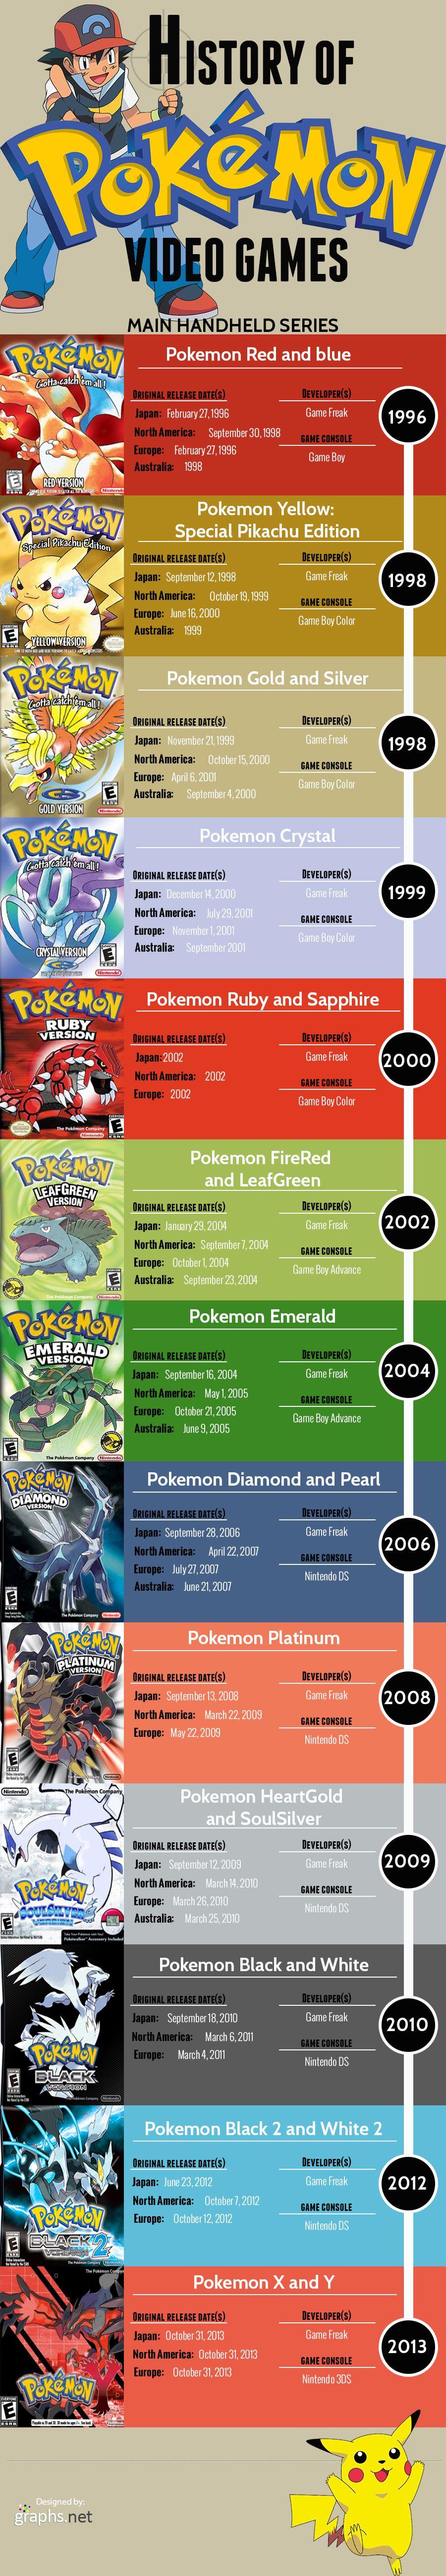 History of Pokémon Video Games